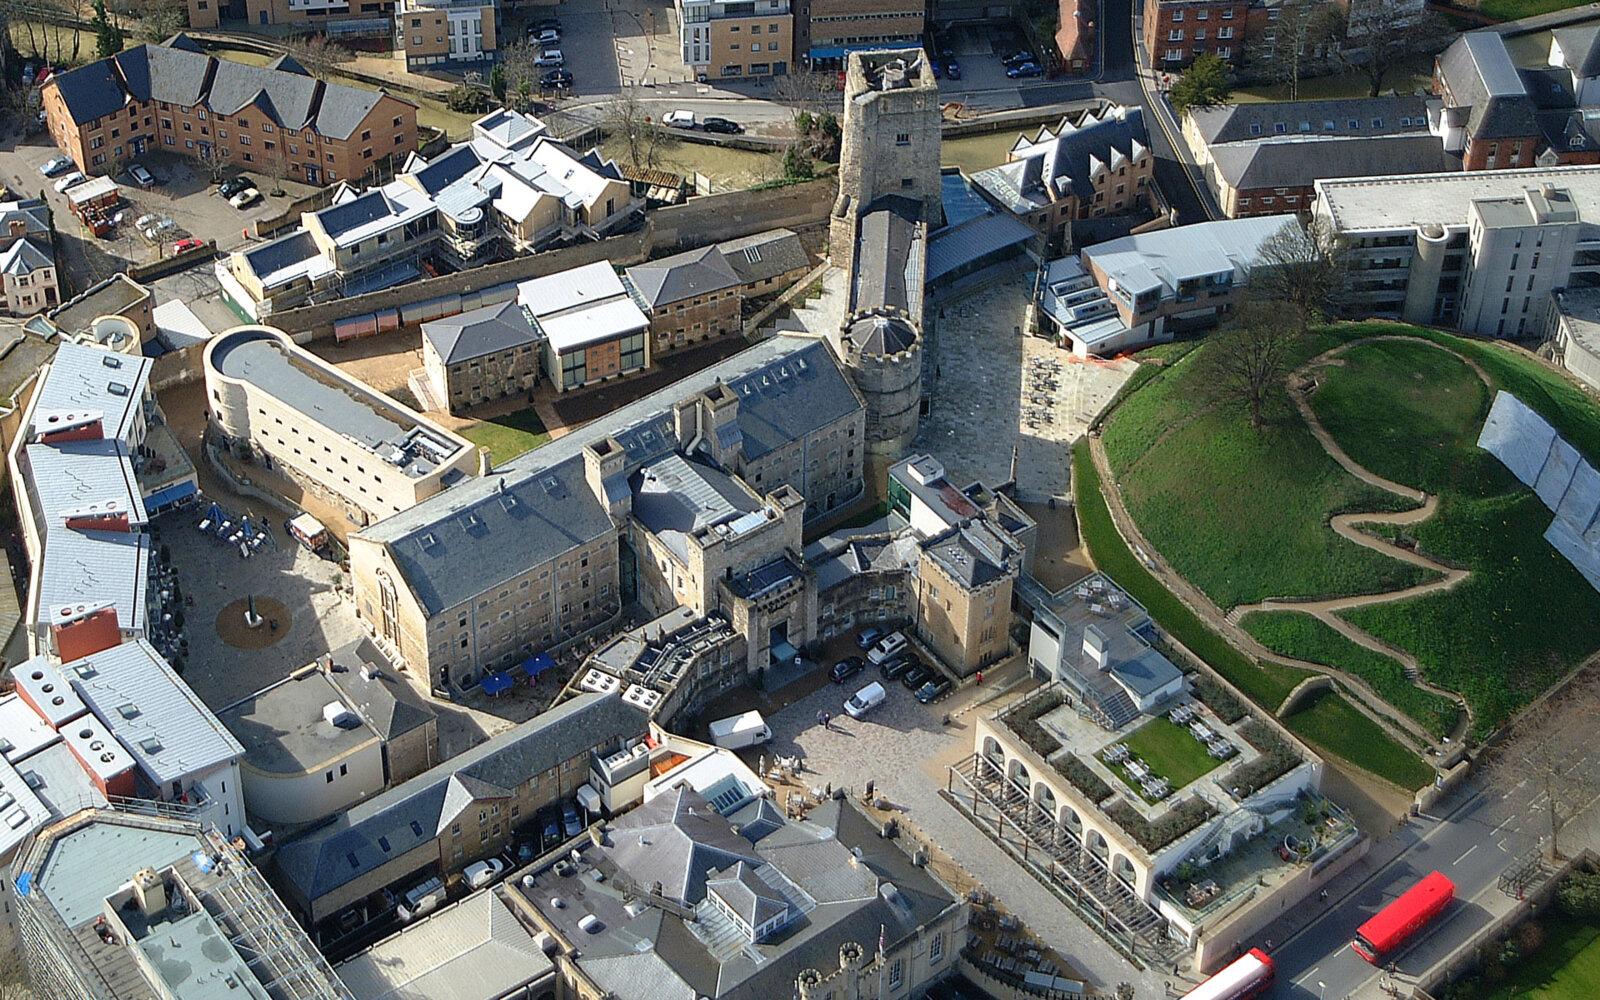 Oxford Castle aerial photo